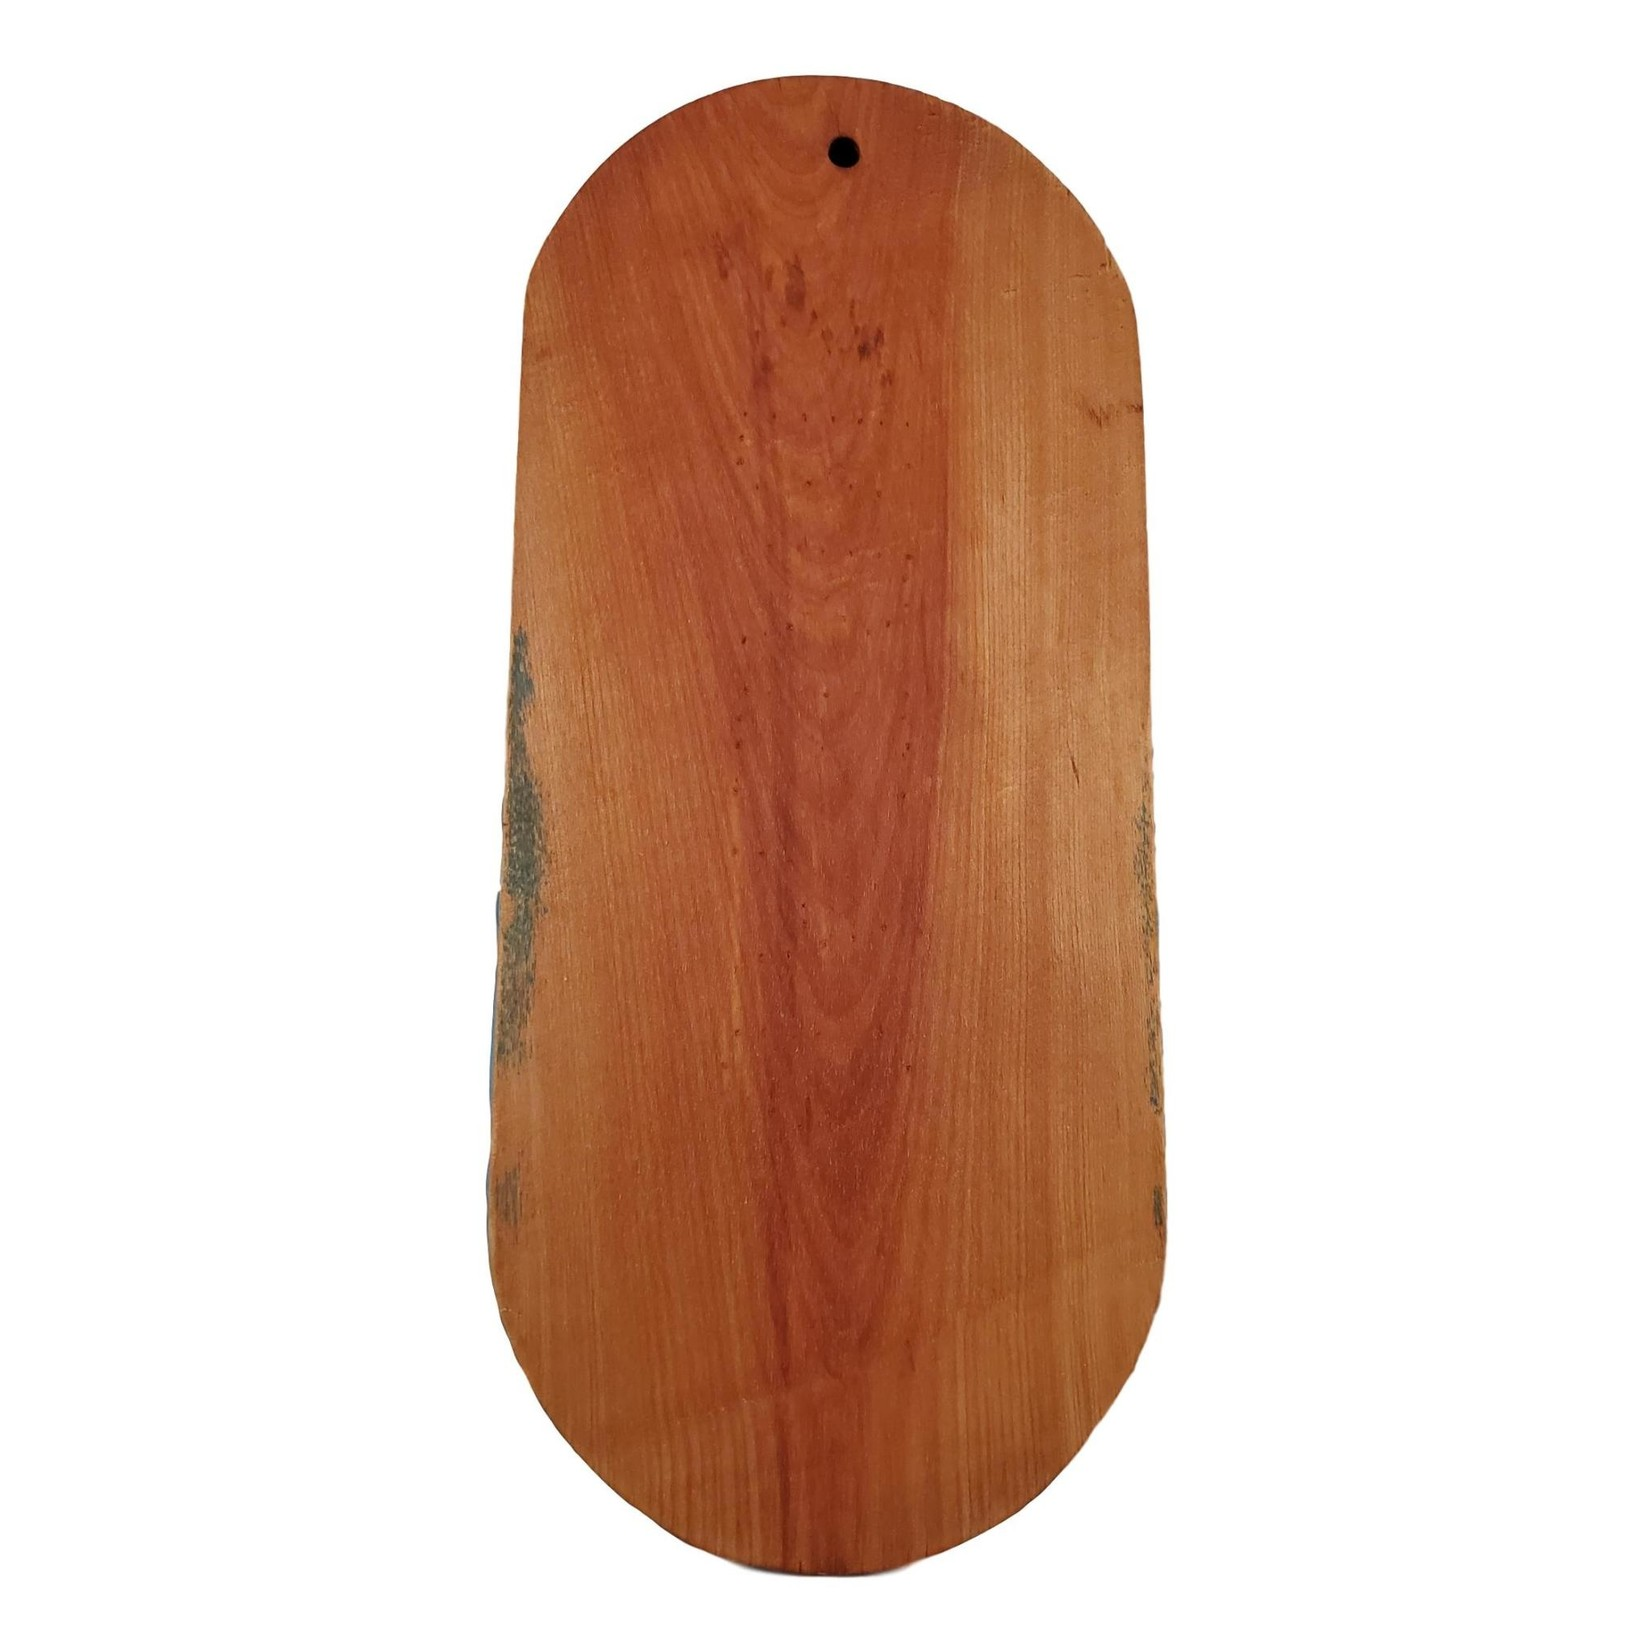 East Coast Sirens Ocean Themed Wood Cutting Board